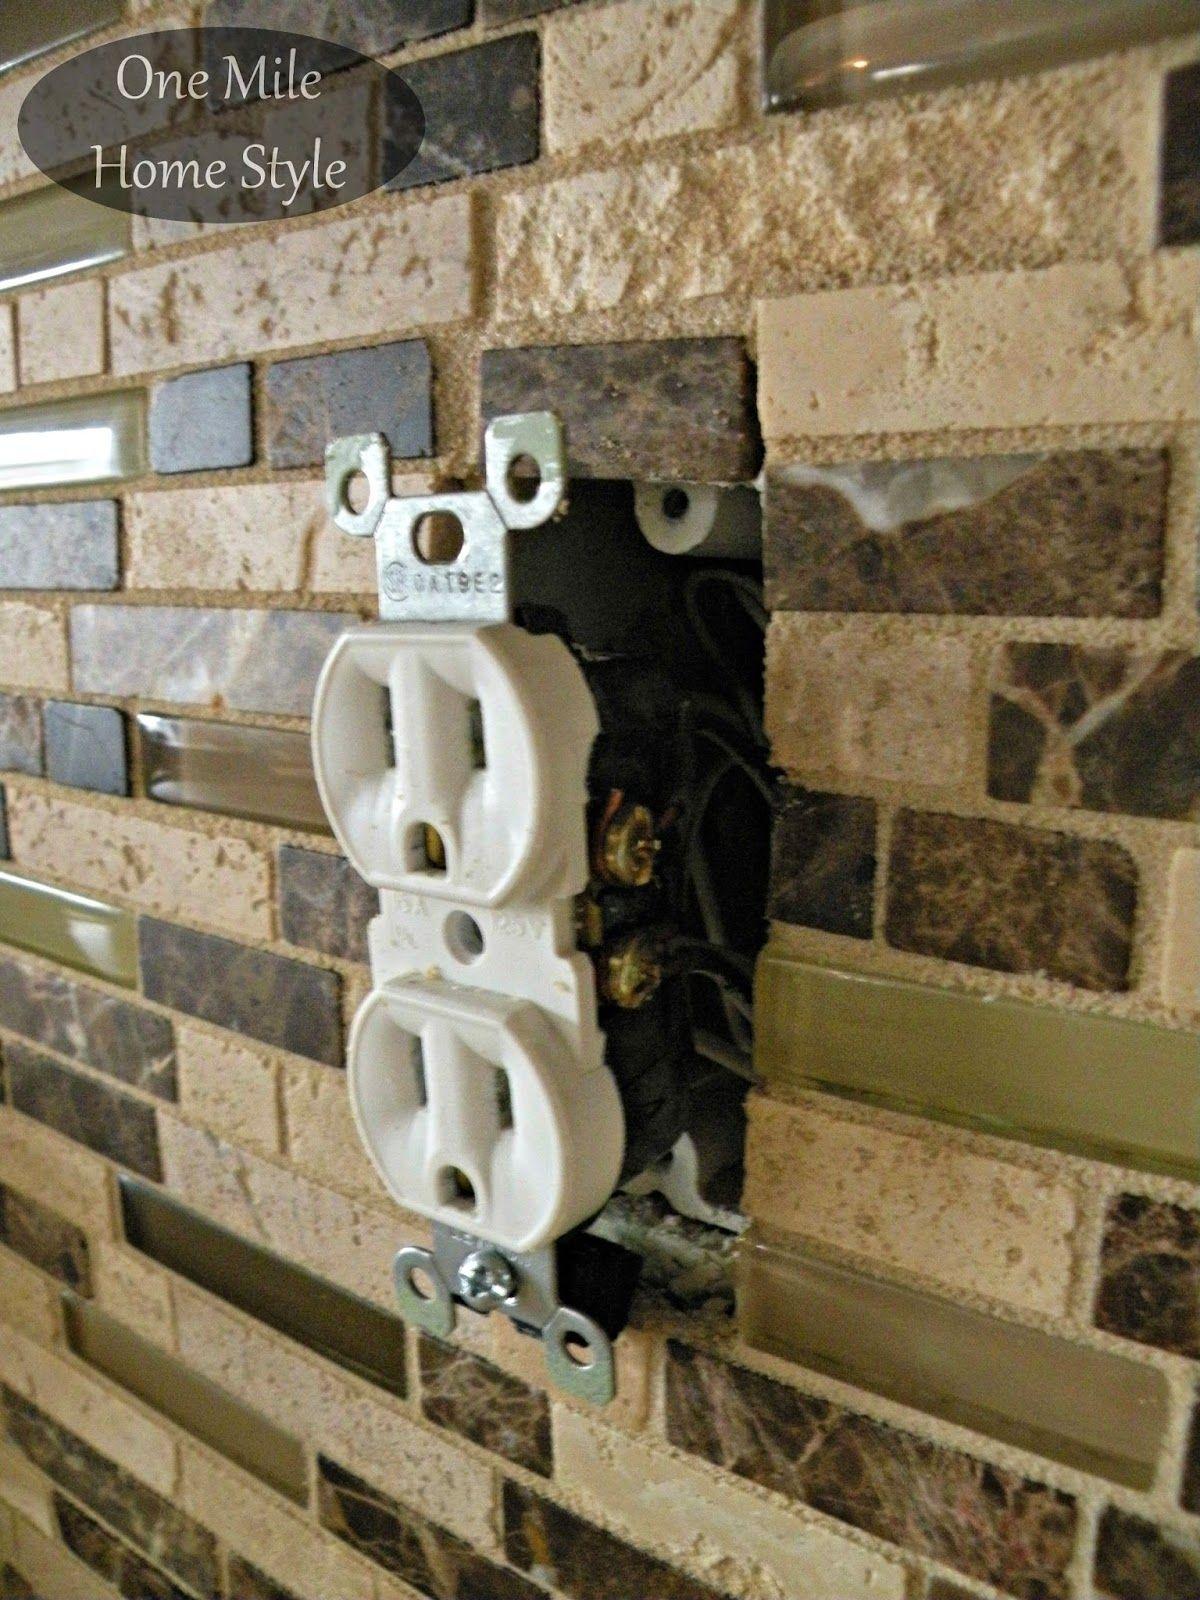 How To Adjust Outlets After Tiling Diy Fixes Pinterest Tiles Electrical Wiring On Home Adjusting